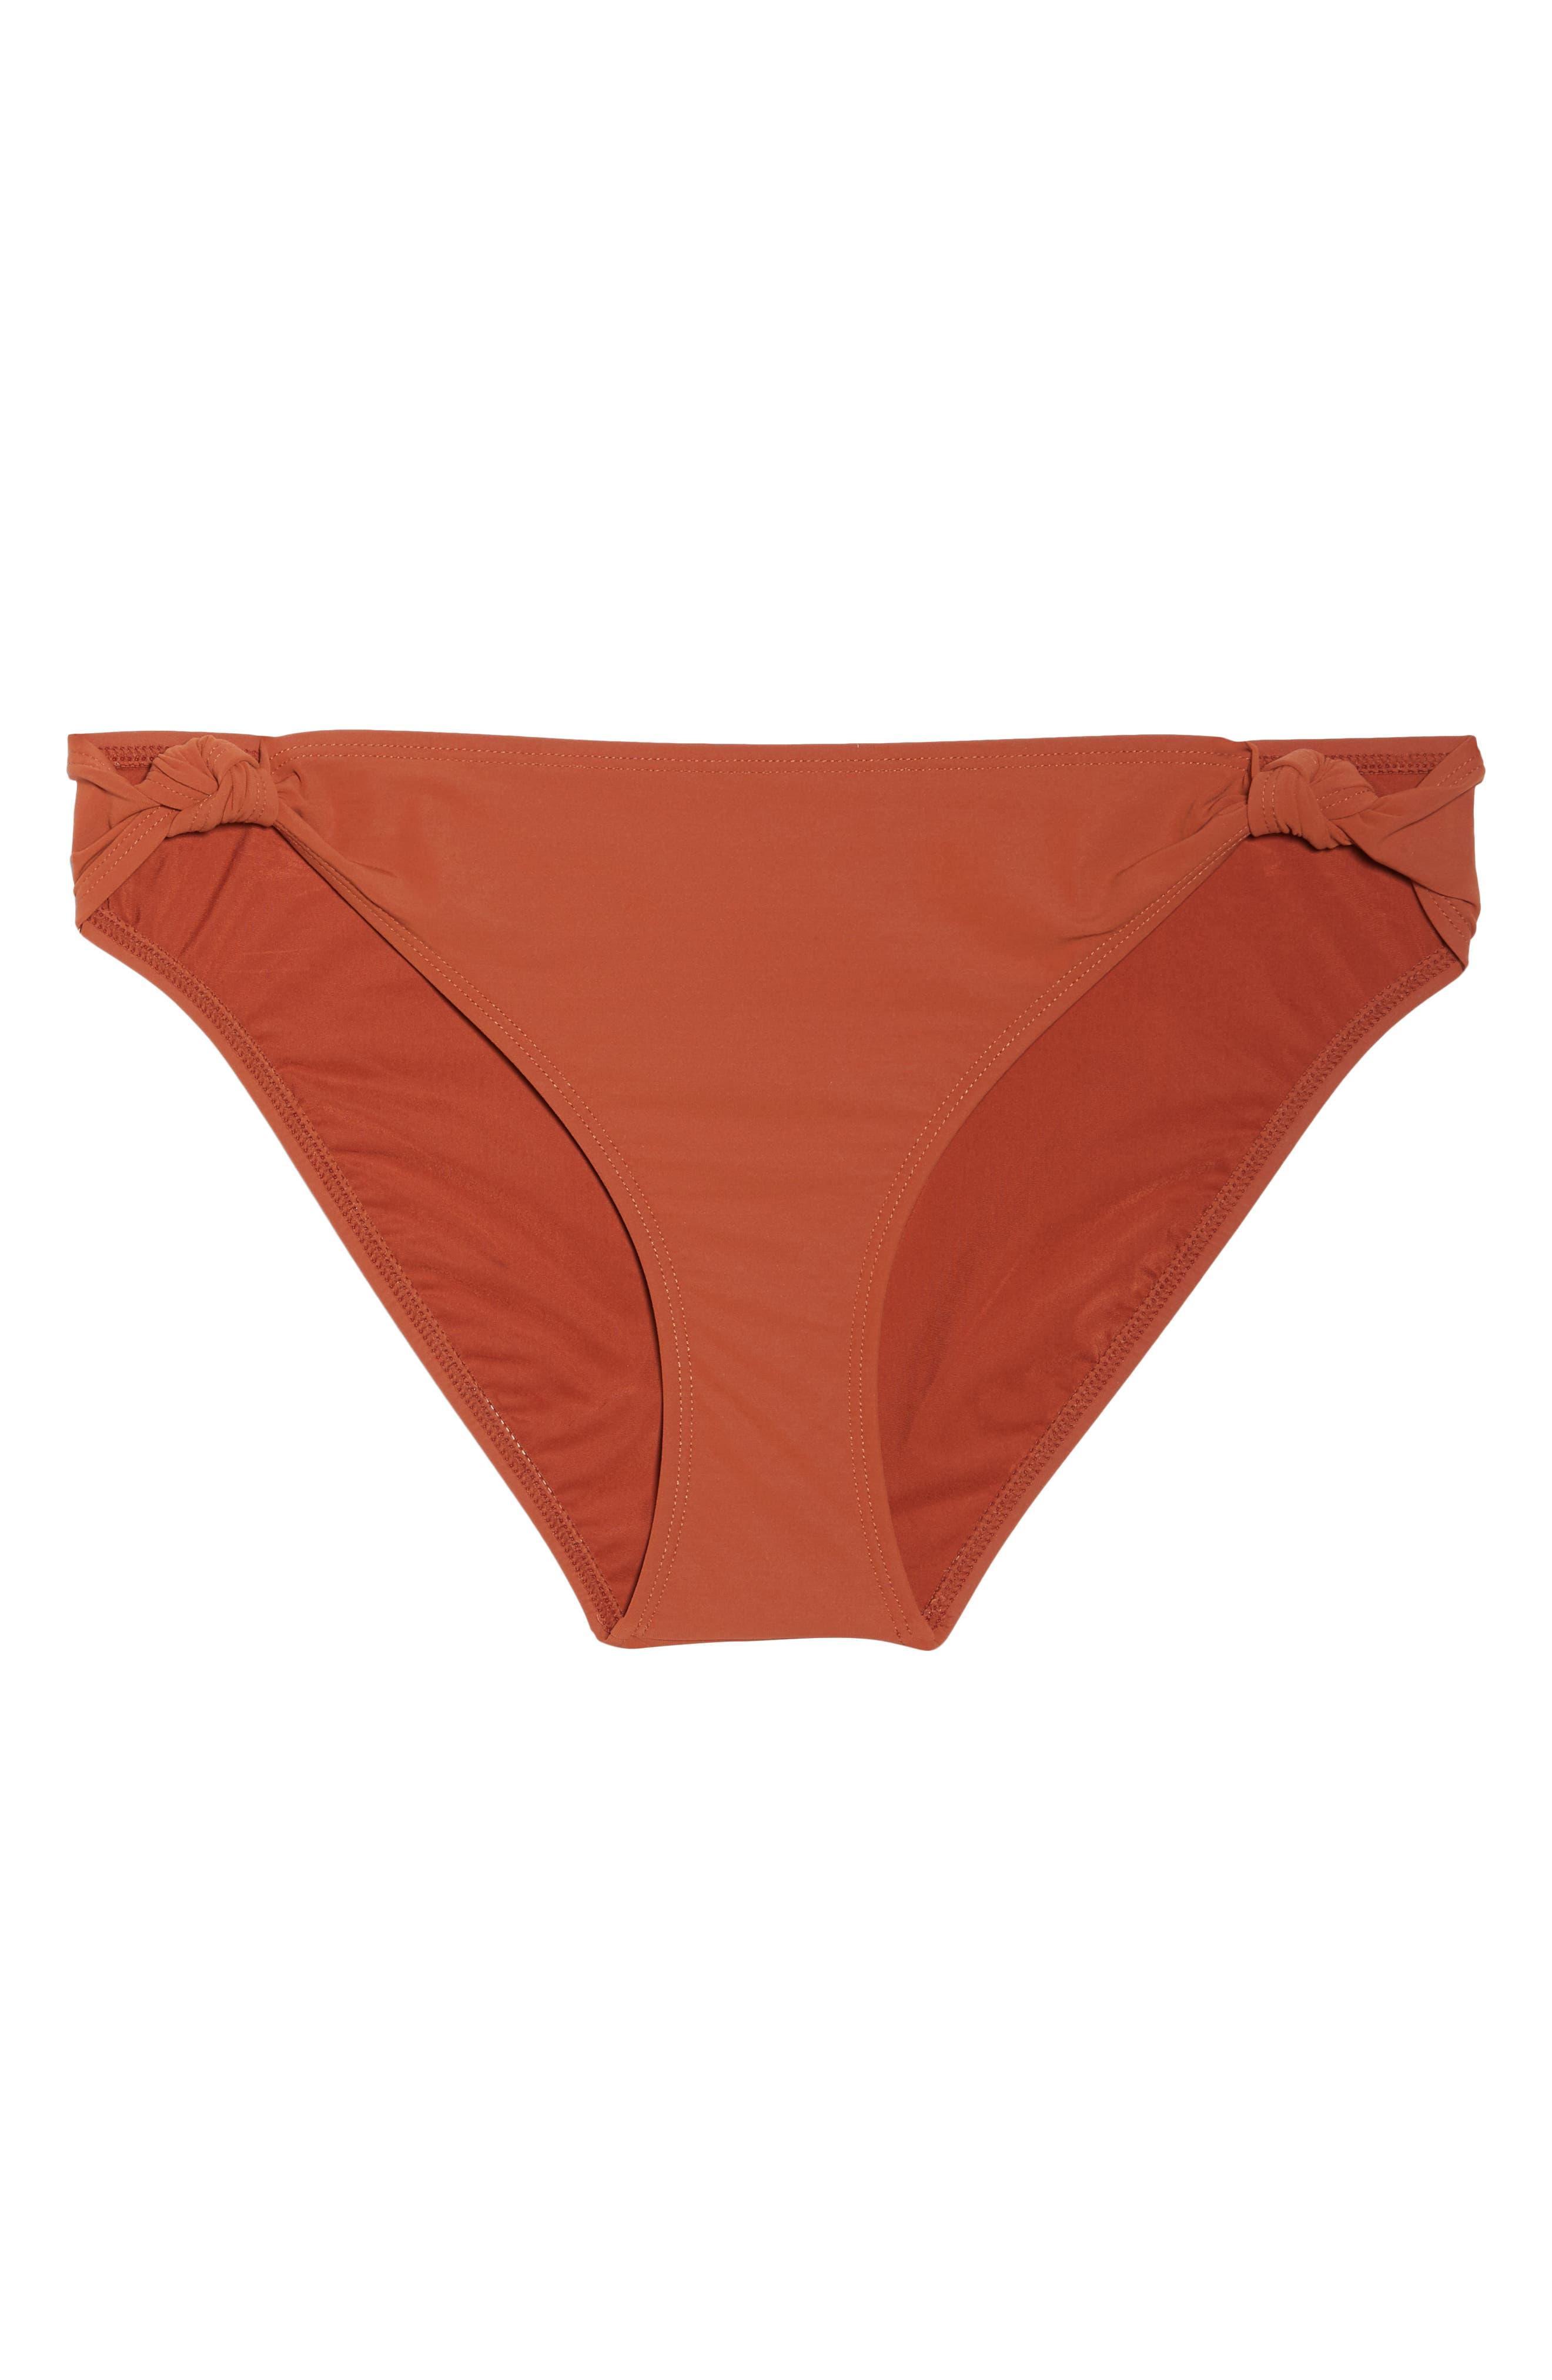 Palma Hipster Bikini Bottoms,                             Alternate thumbnail 6, color,                             DESERT SPICE